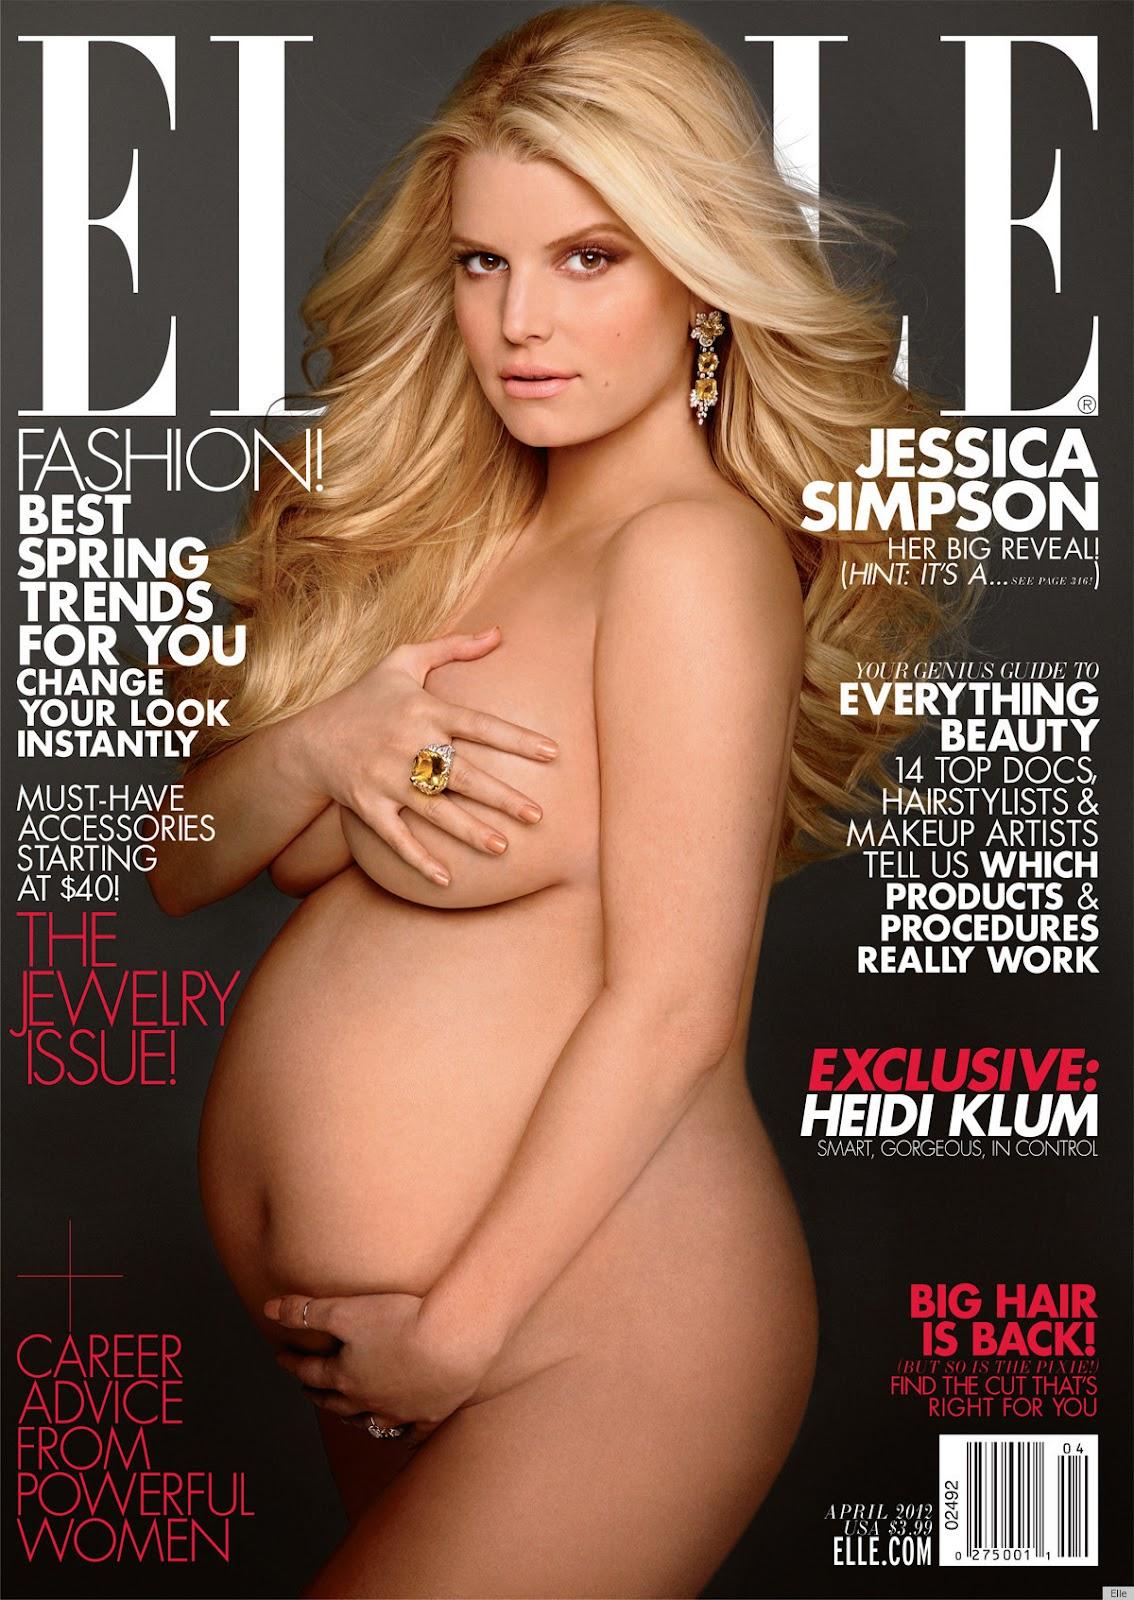 http://3.bp.blogspot.com/-4kEKFRkOxmA/T1g8RBEhSoI/AAAAAAAAE-c/dQncSLwIMz4/s1600/JESSICA-SIMPSON-ELLE-PREGNANT.jpg